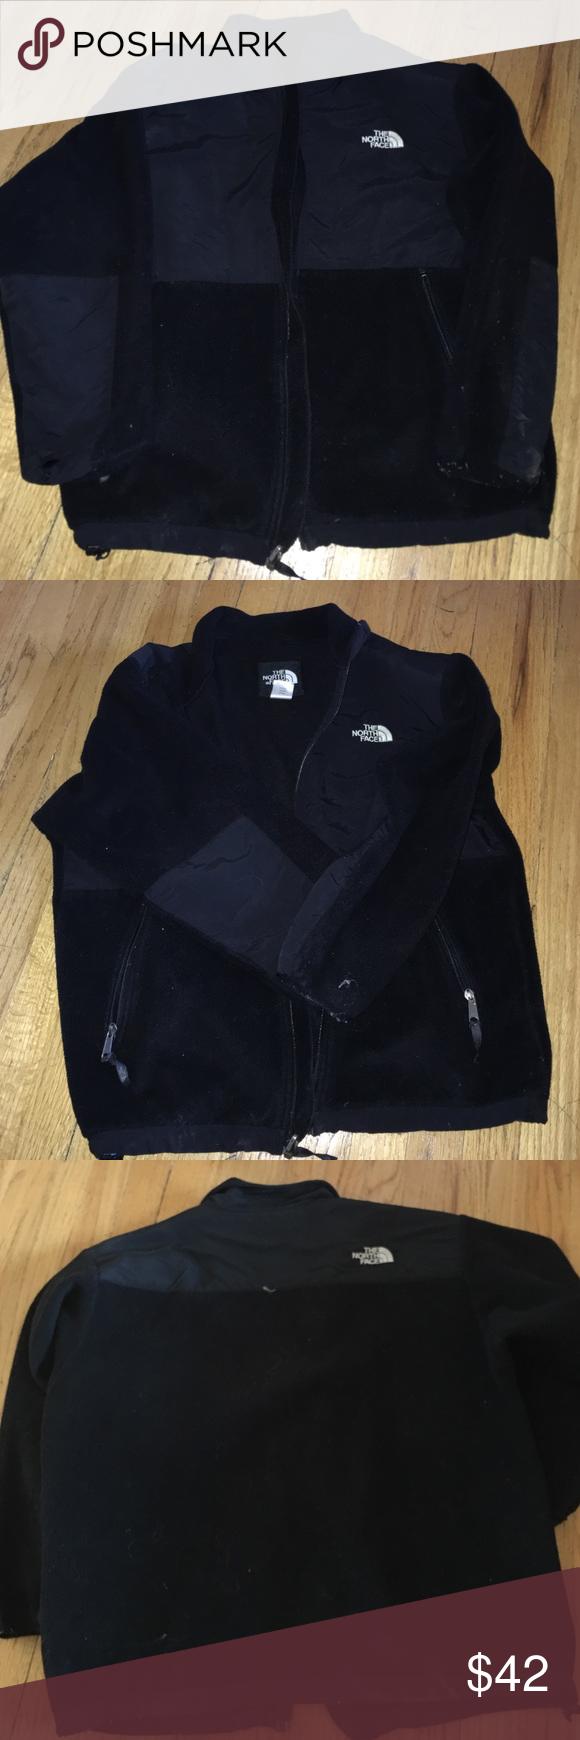 North face youth XL winter jacket North face youth XL size winter jacket, women's x small/small North Face Jackets & Coats